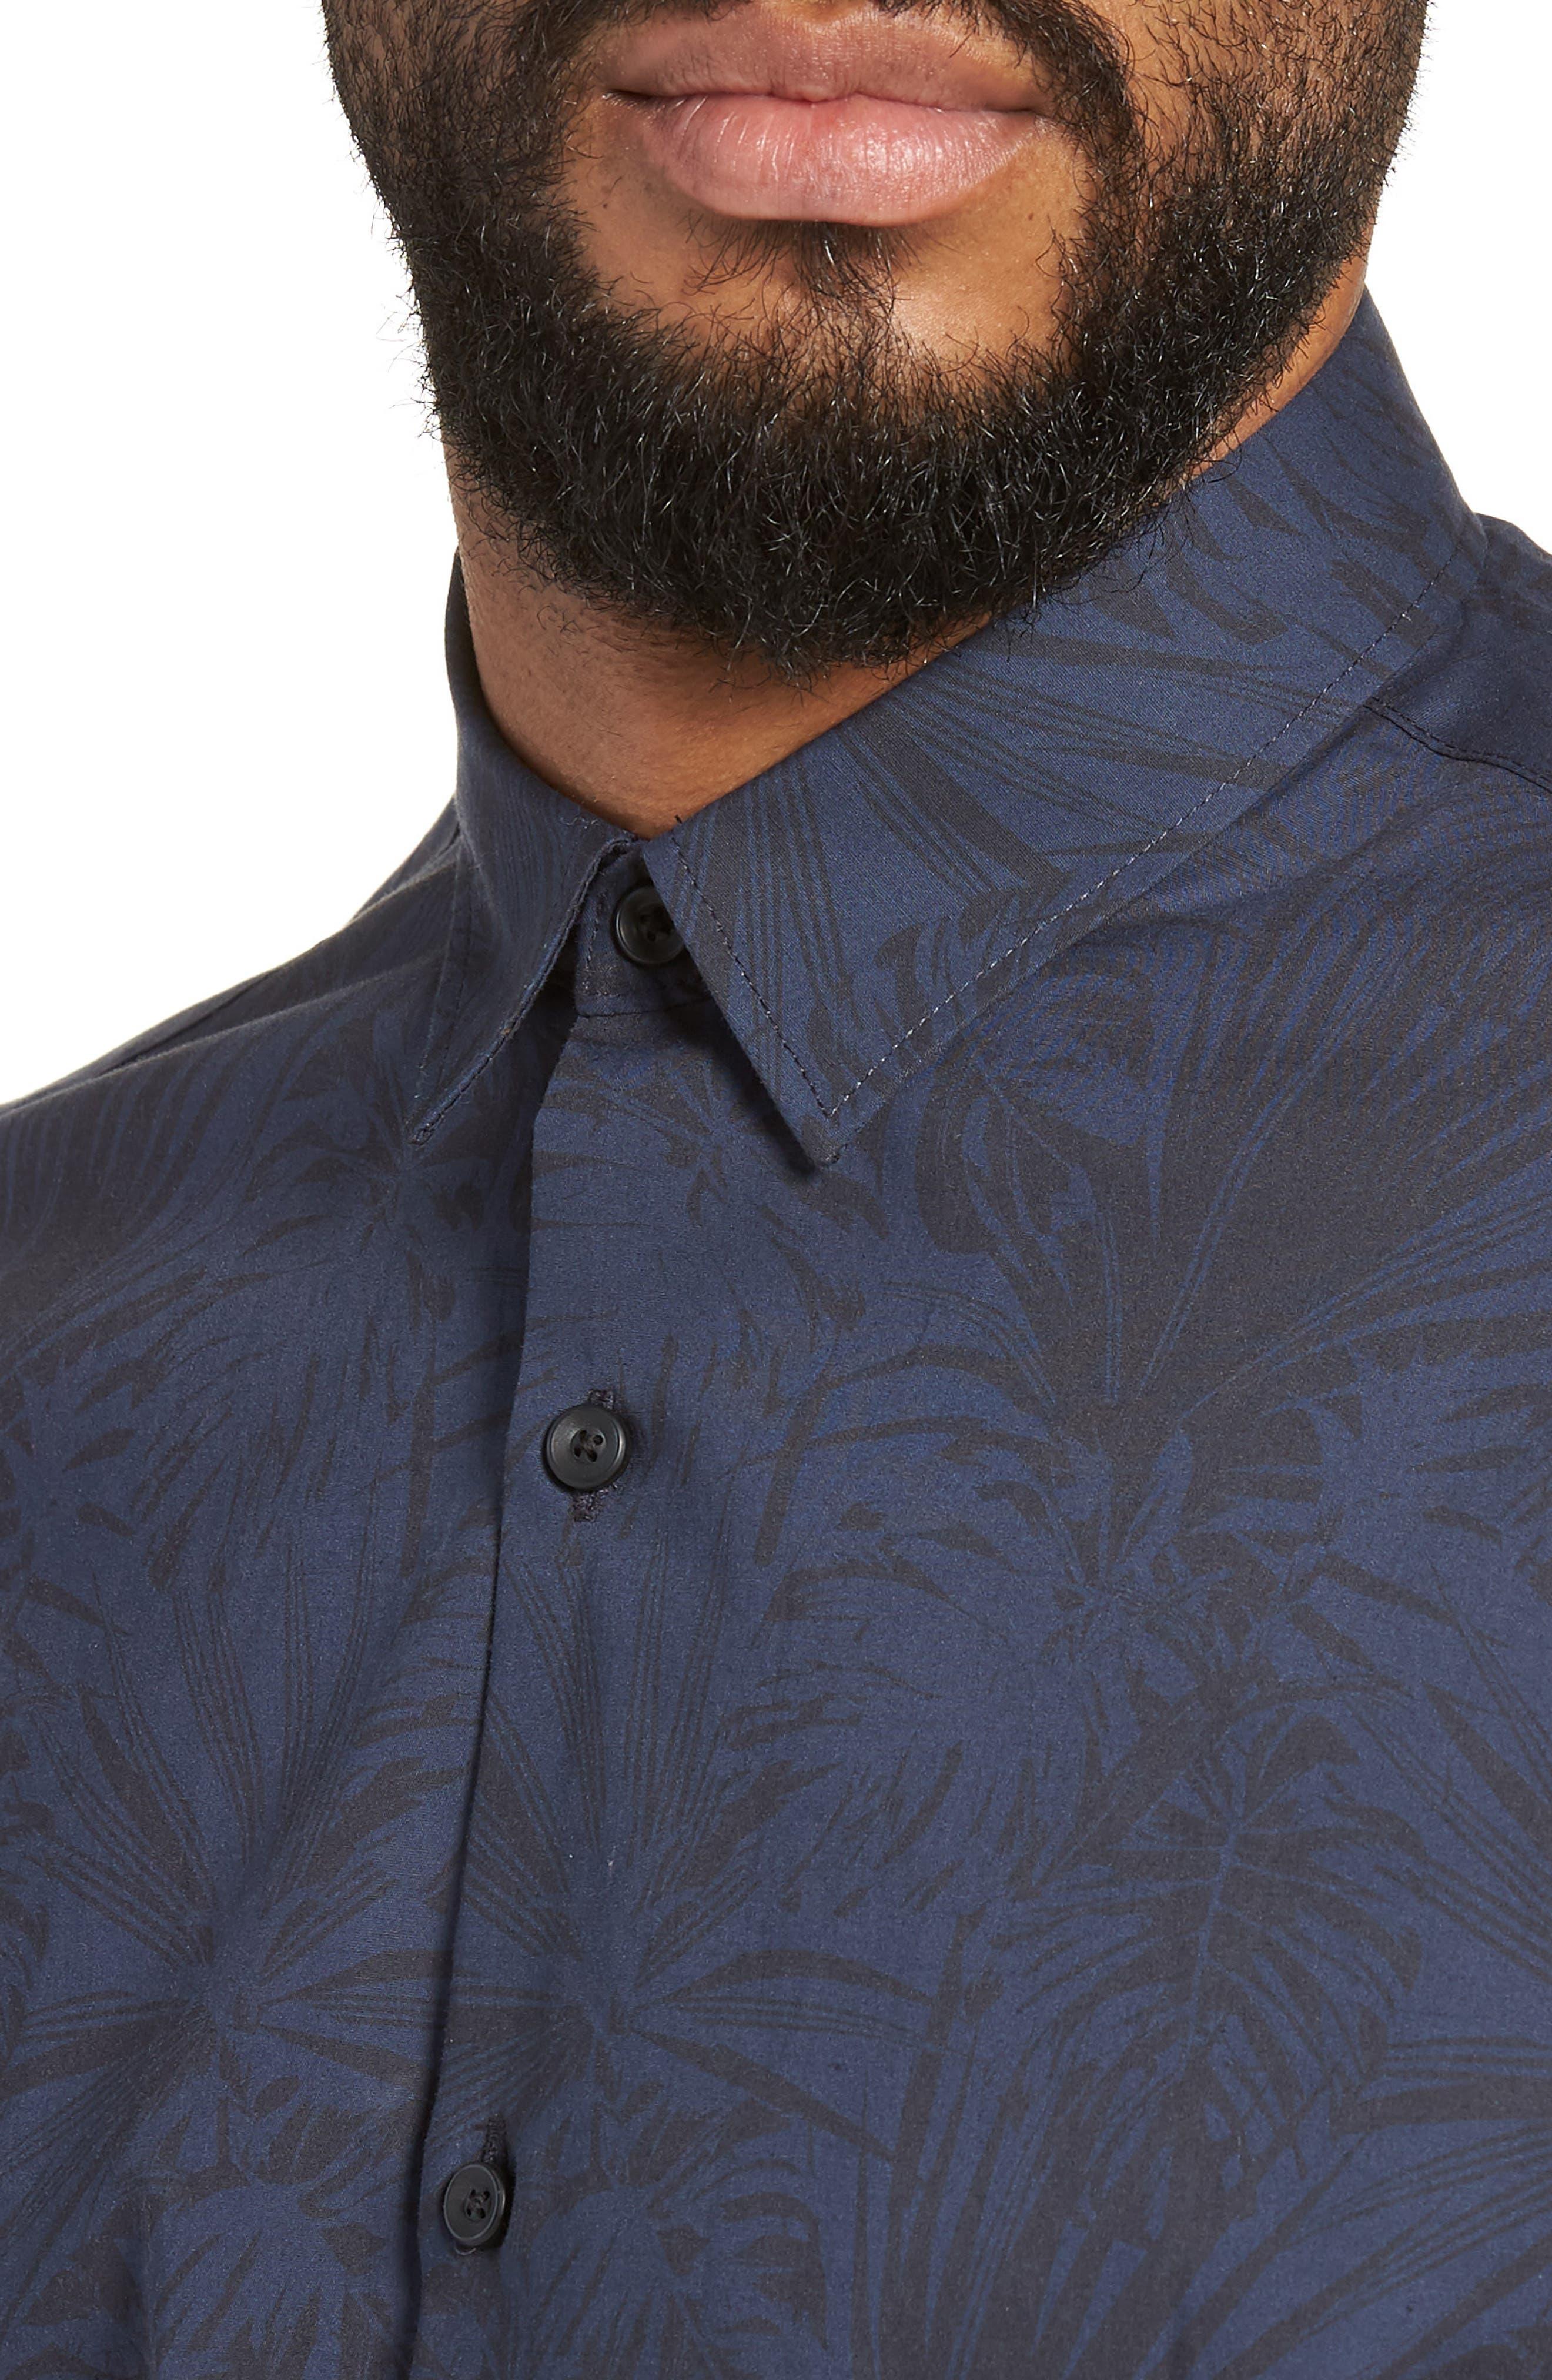 Trim Fit Stretch Print Sport Shirt,                             Alternate thumbnail 2, color,                             Black Navy Palm